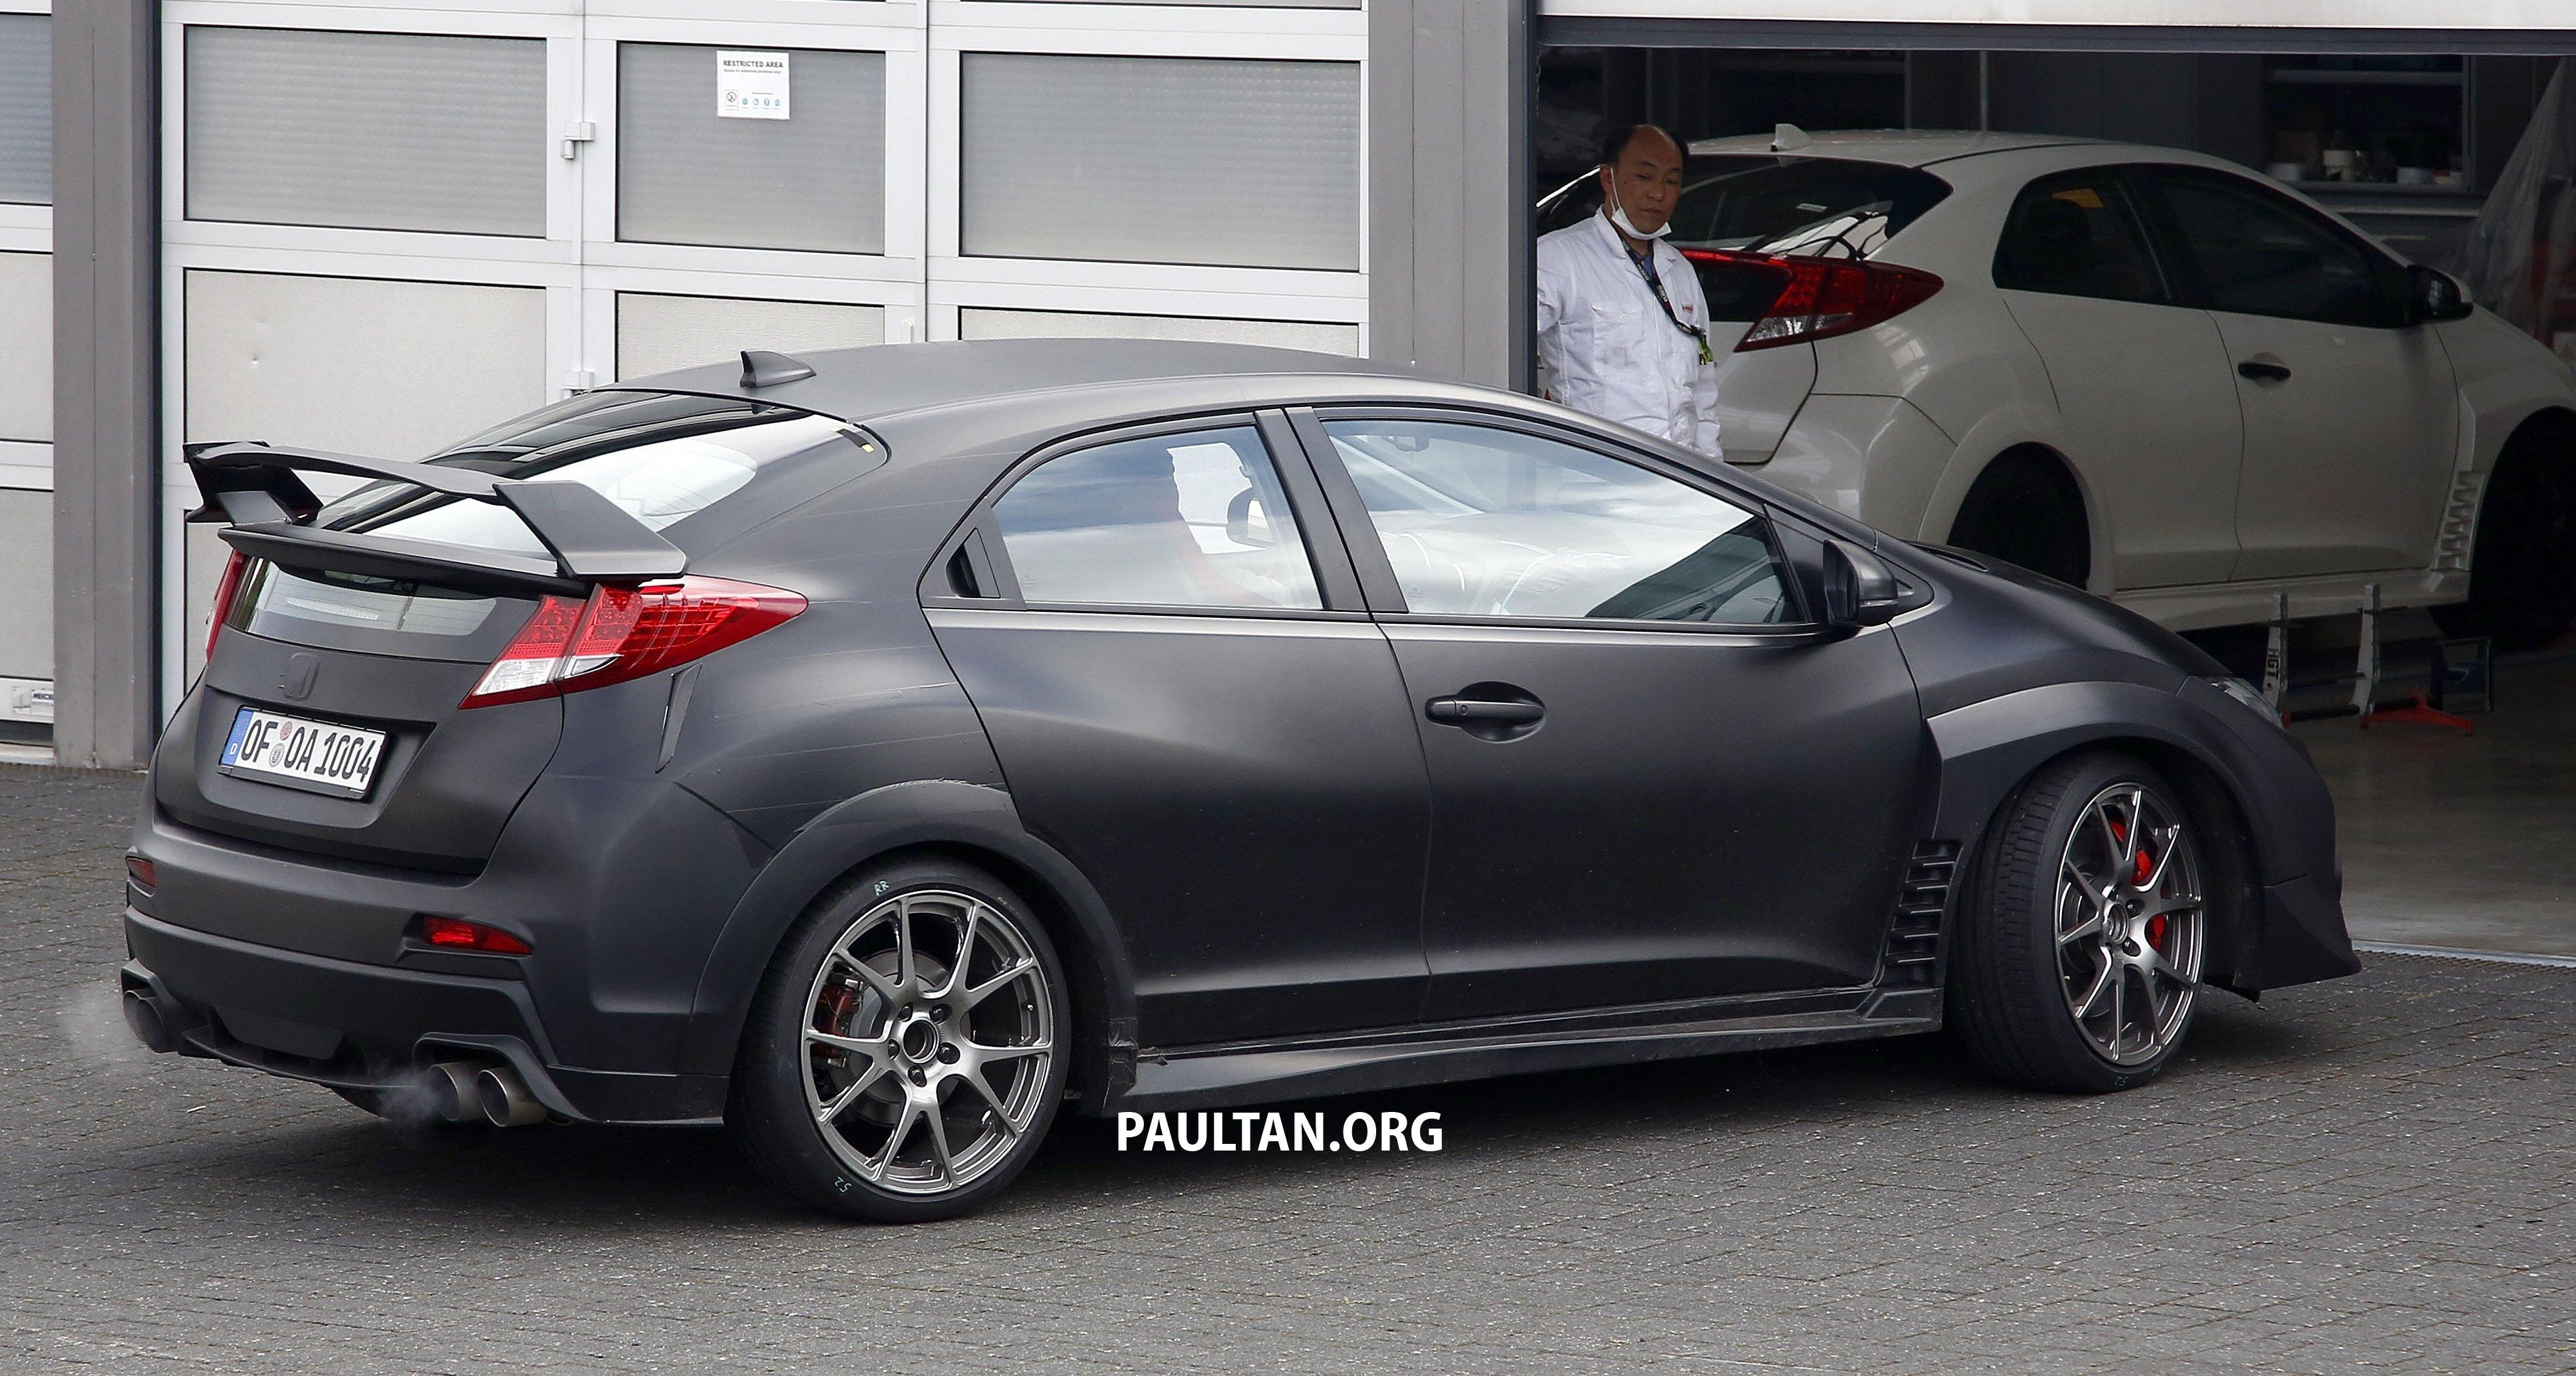 Spyshots 2015 Honda Civic Type R Drops The Camo